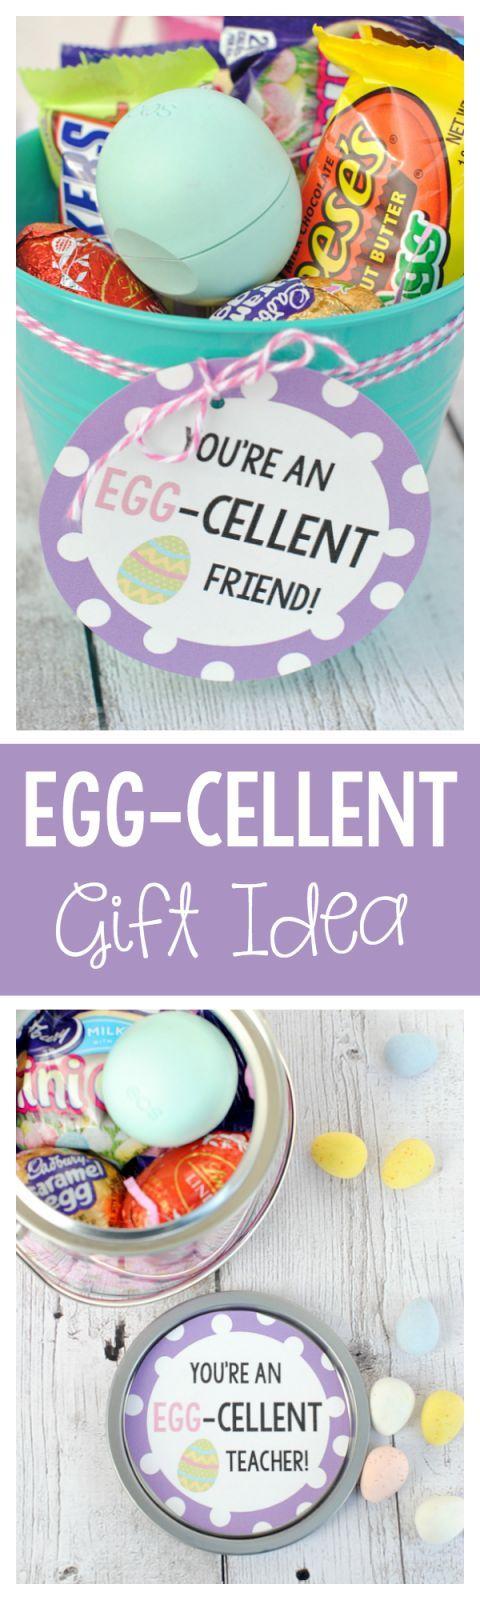 Egg cellent easter gift idea cute gift ideas cute gifts and egg cellent easter gift idea negle Images